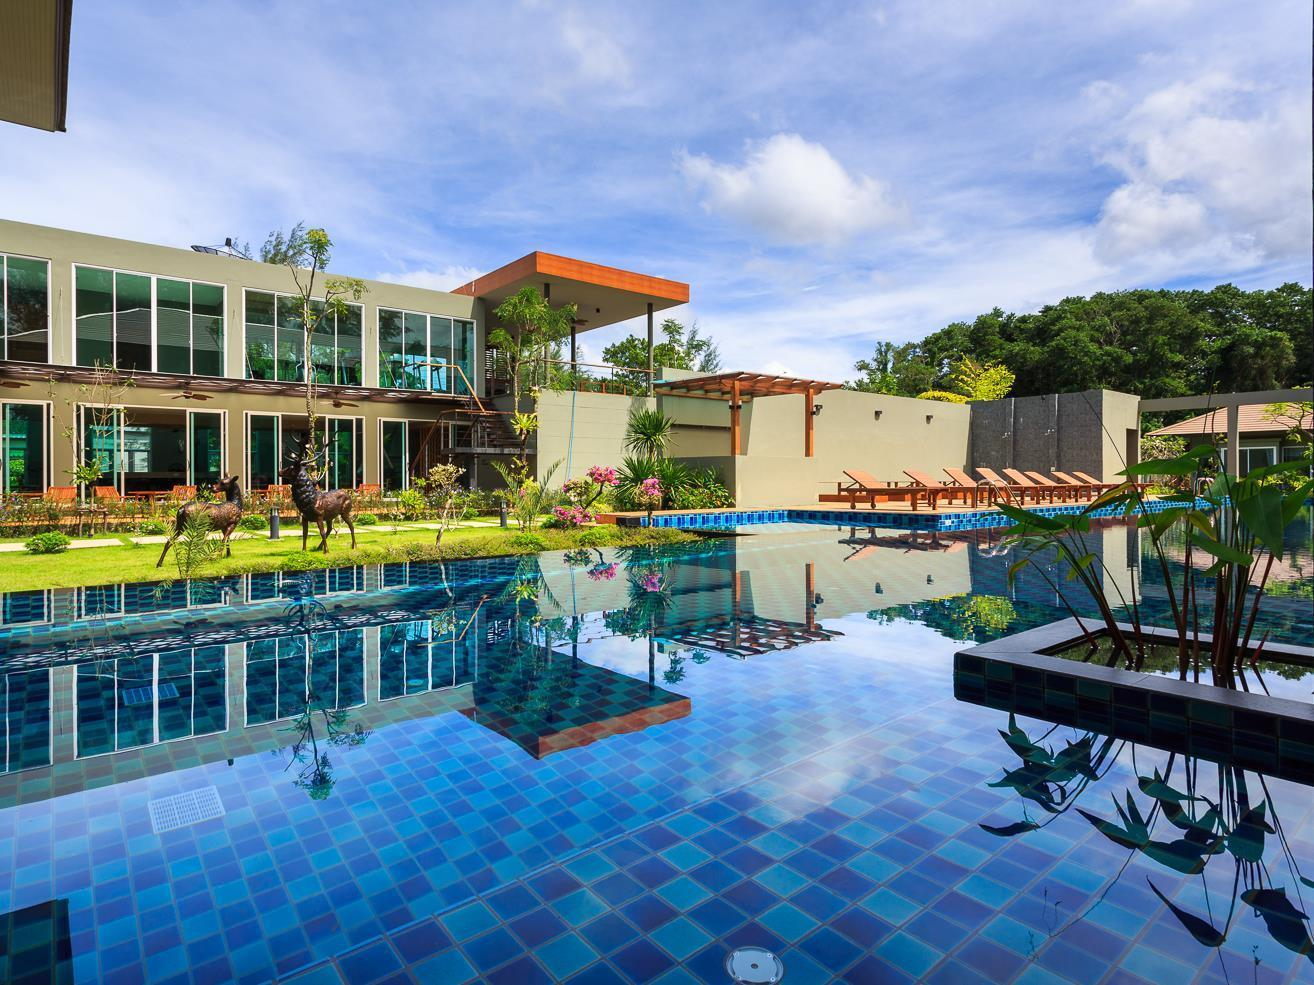 Khao Lak Forest Resort Thailand FAQ 2016, What facilities